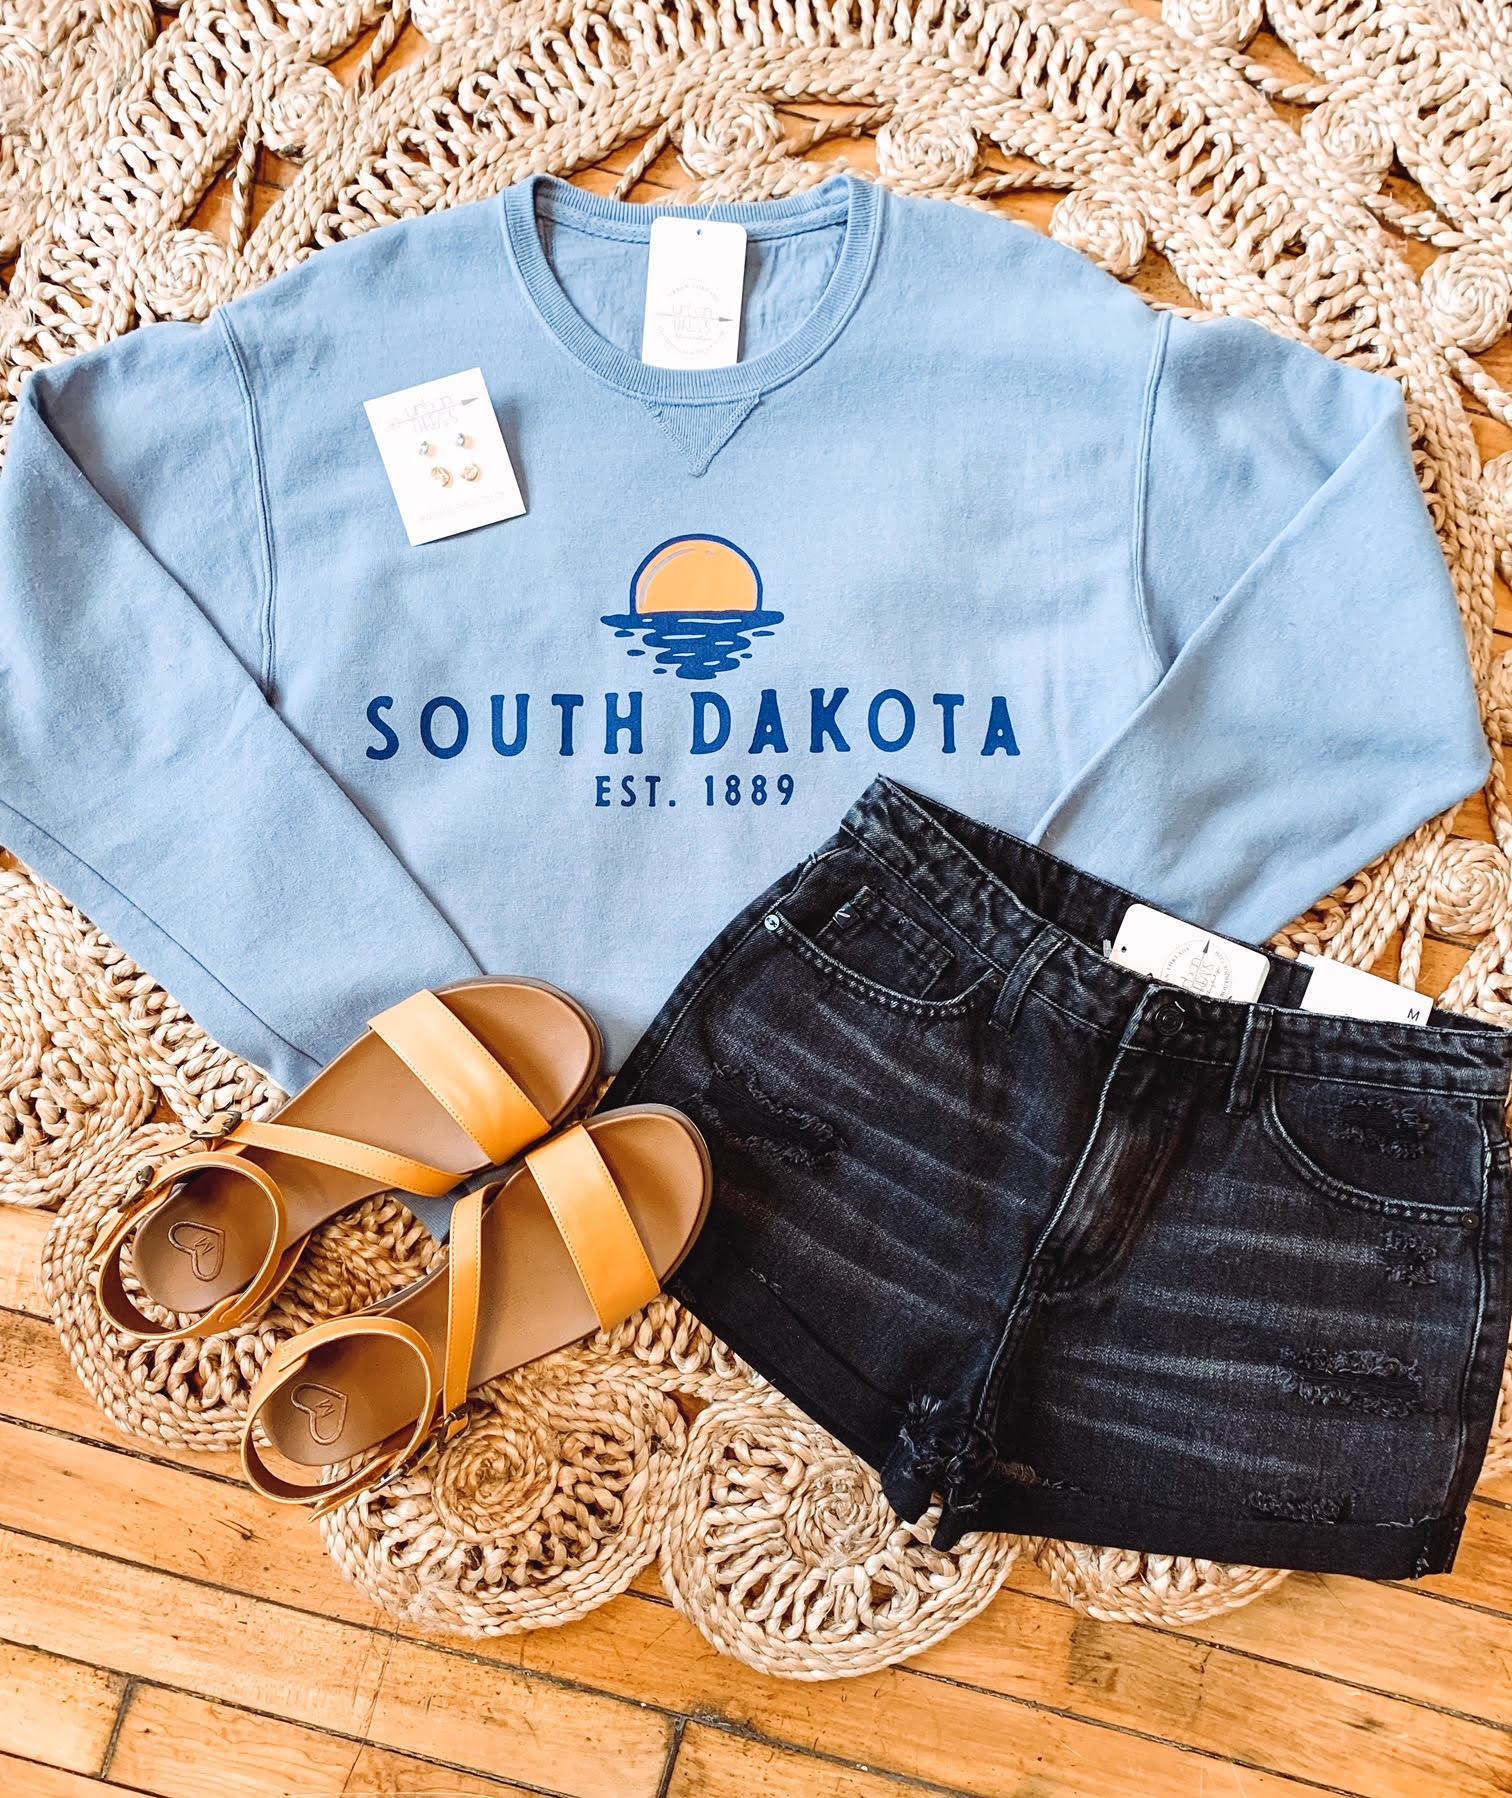 South Dakota Sunset Sweatshirt